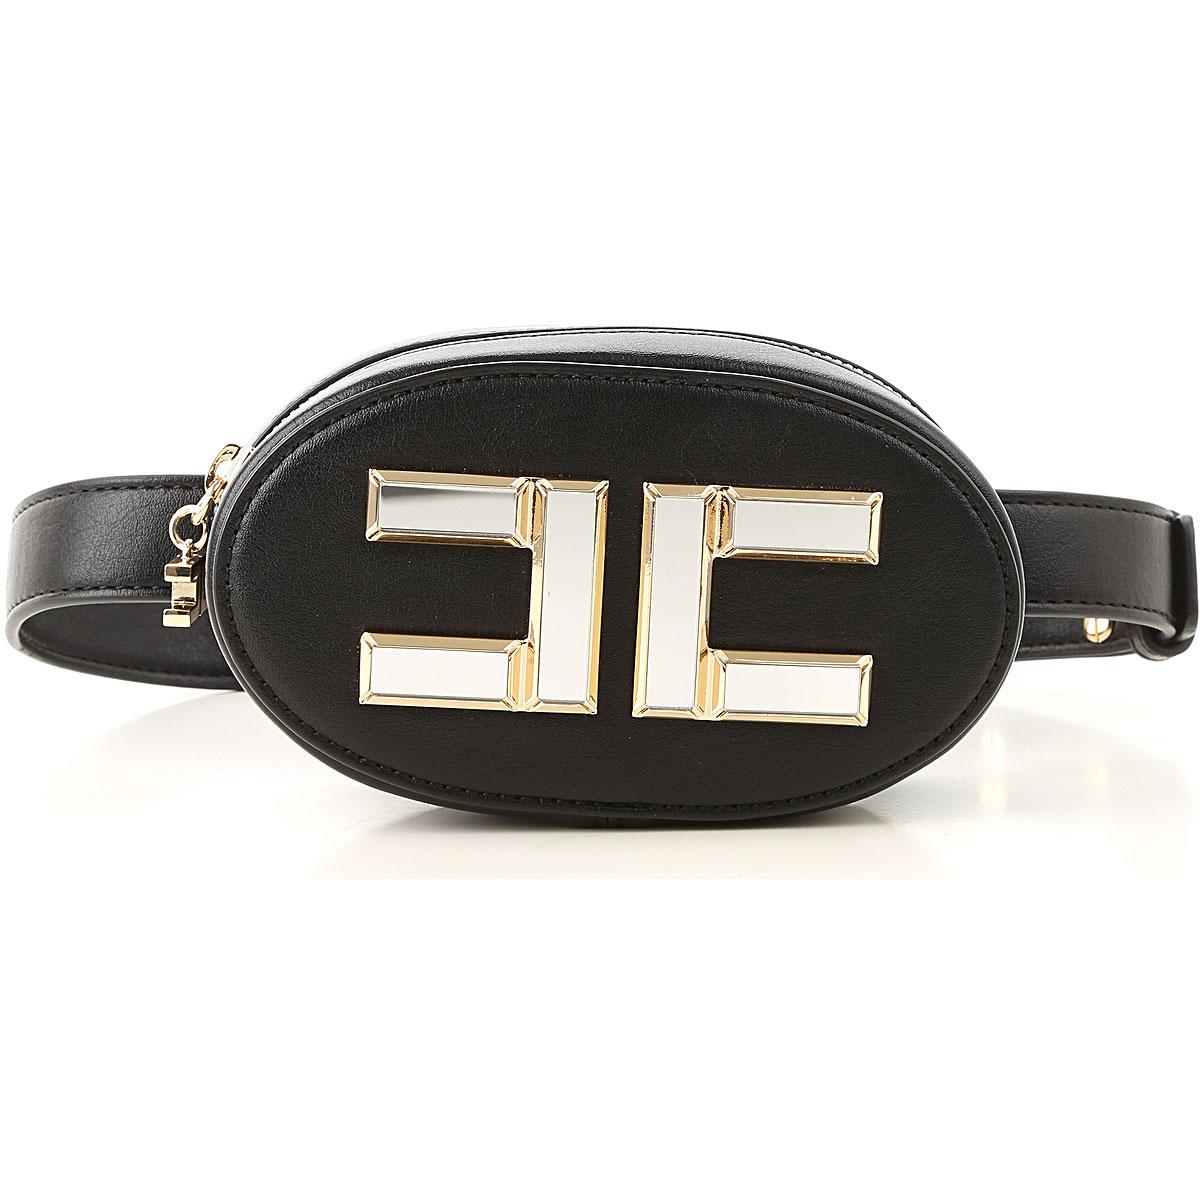 Elisabetta Franchi Girls Handbag On Sale, Black, polyurethane, 2019